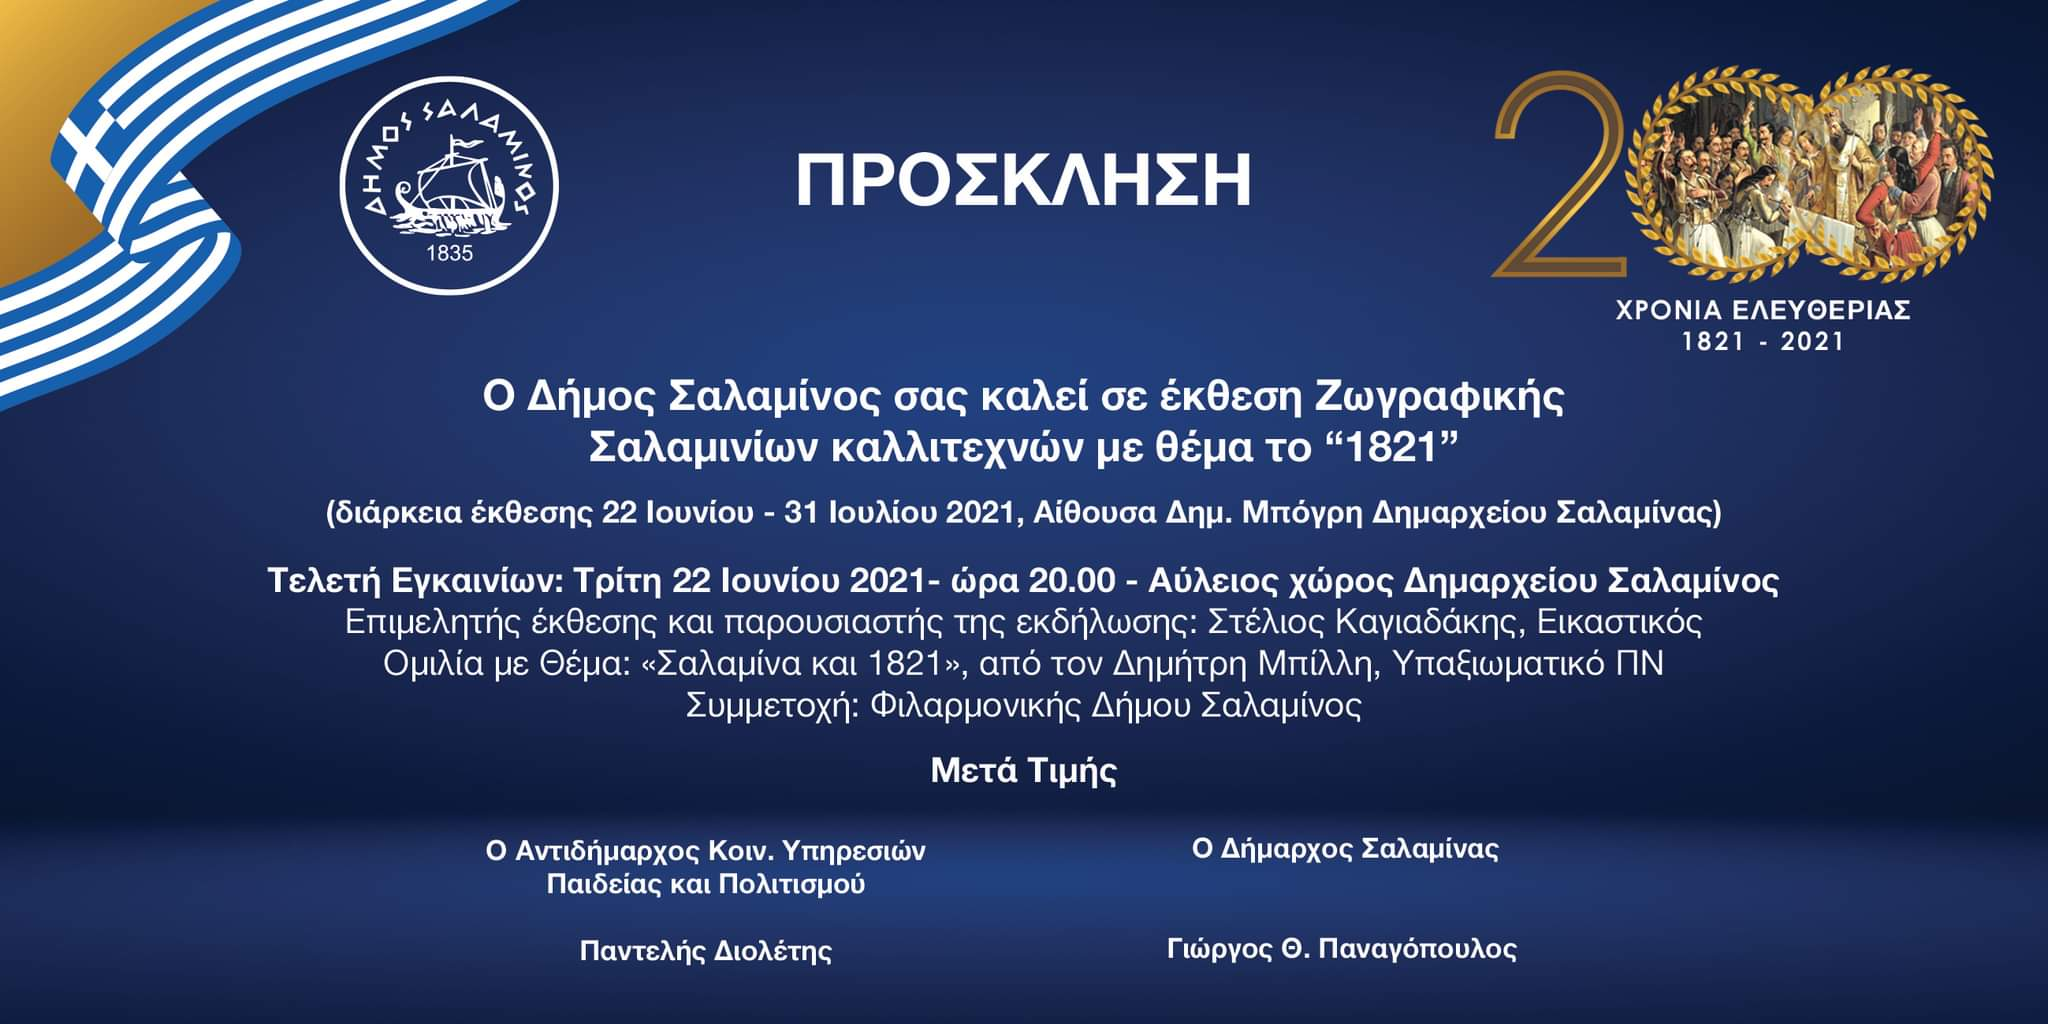 PROSKLISI2-7-6-2021